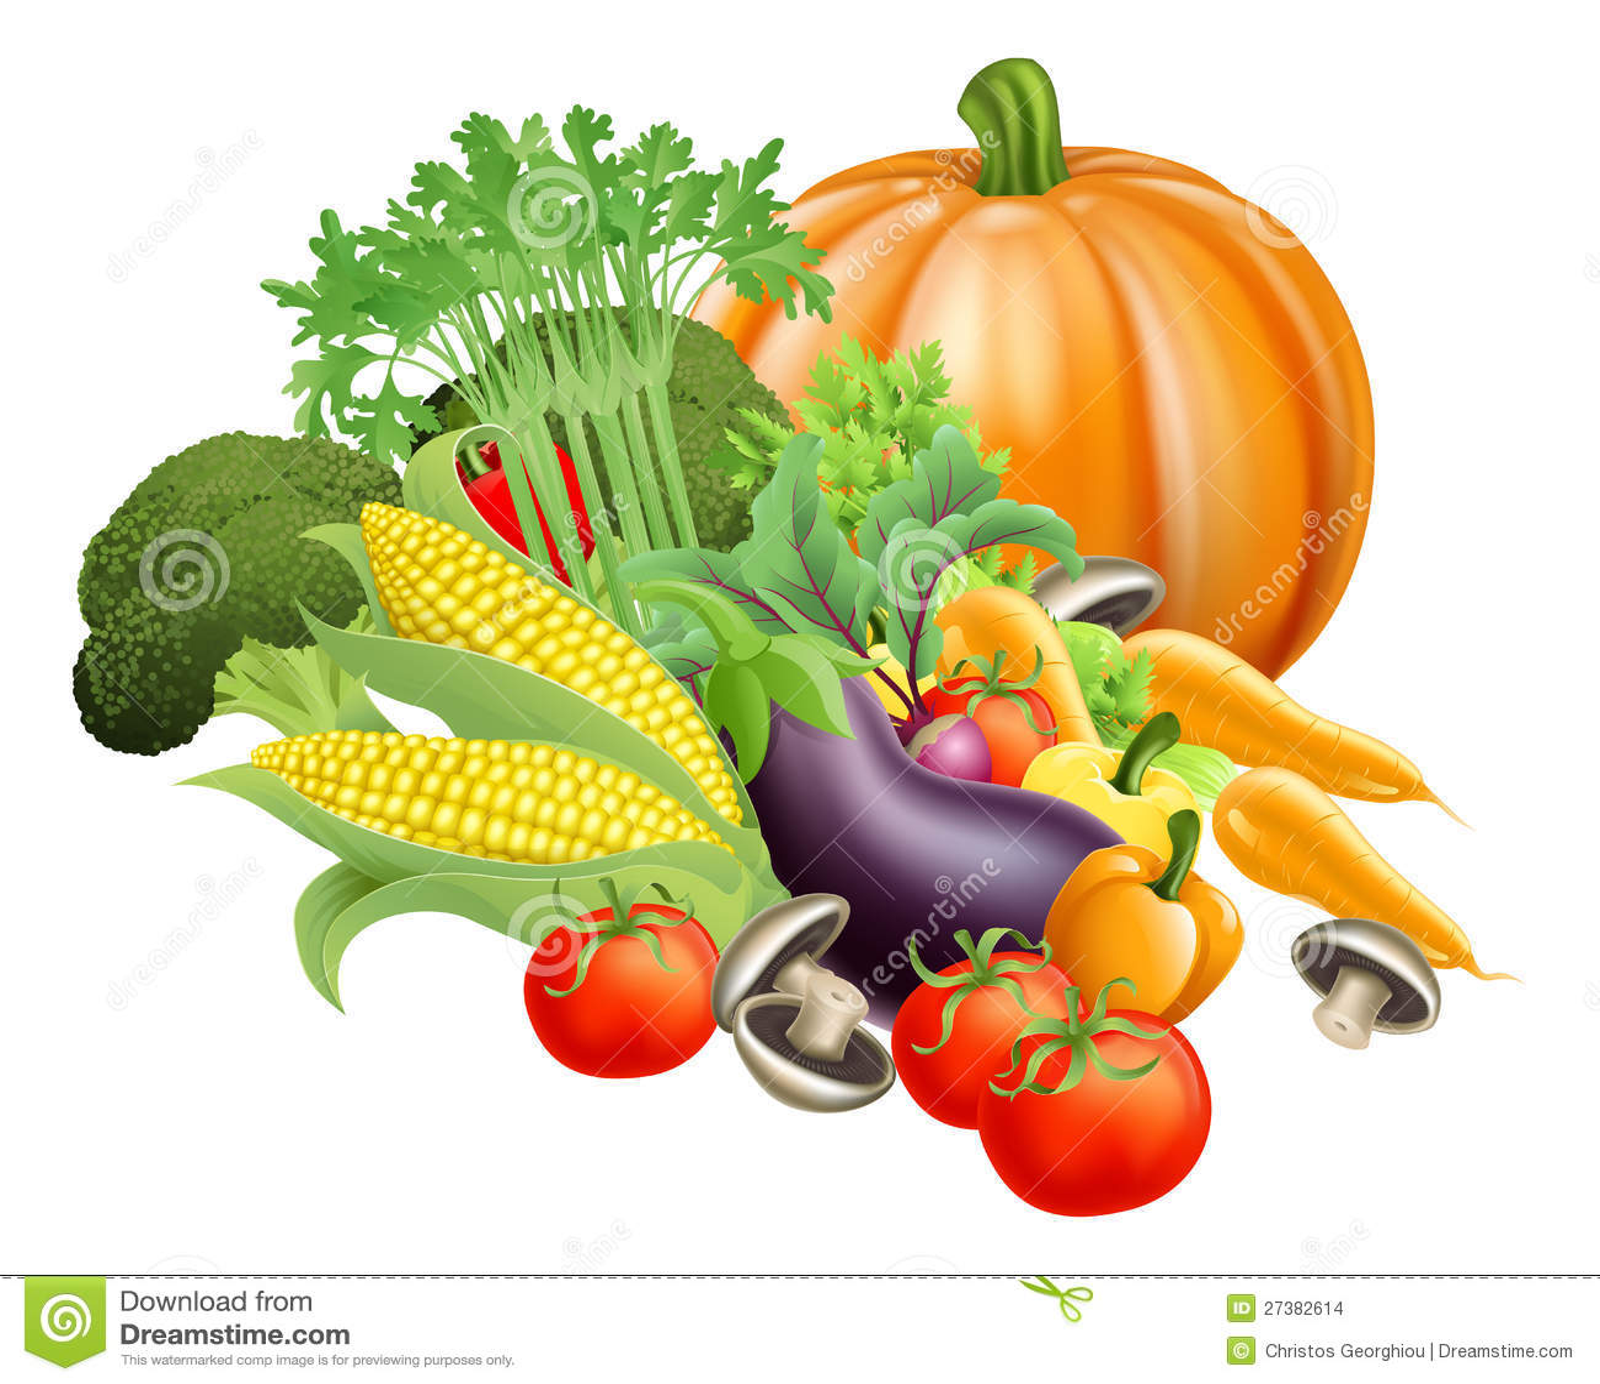 de772e14435 Illustration of produce assortment of healthy fresh vegetables. Designers  ...